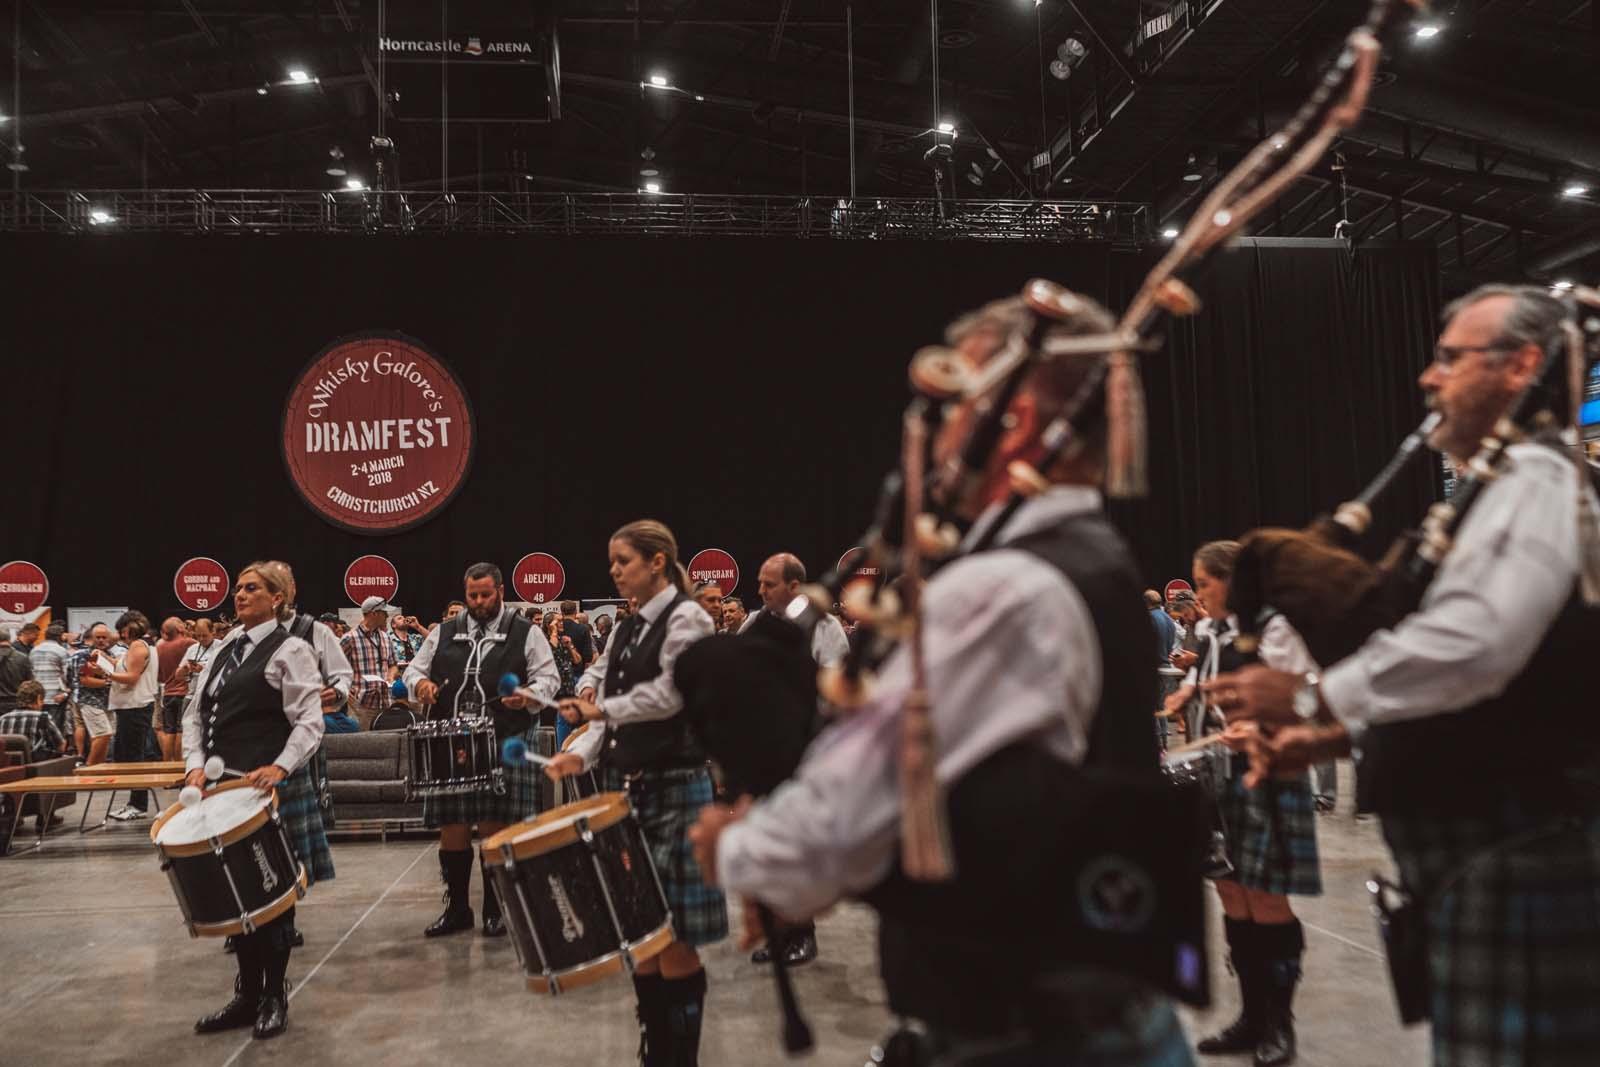 Dramfest 2018 for Whisky Galore-401.jpg